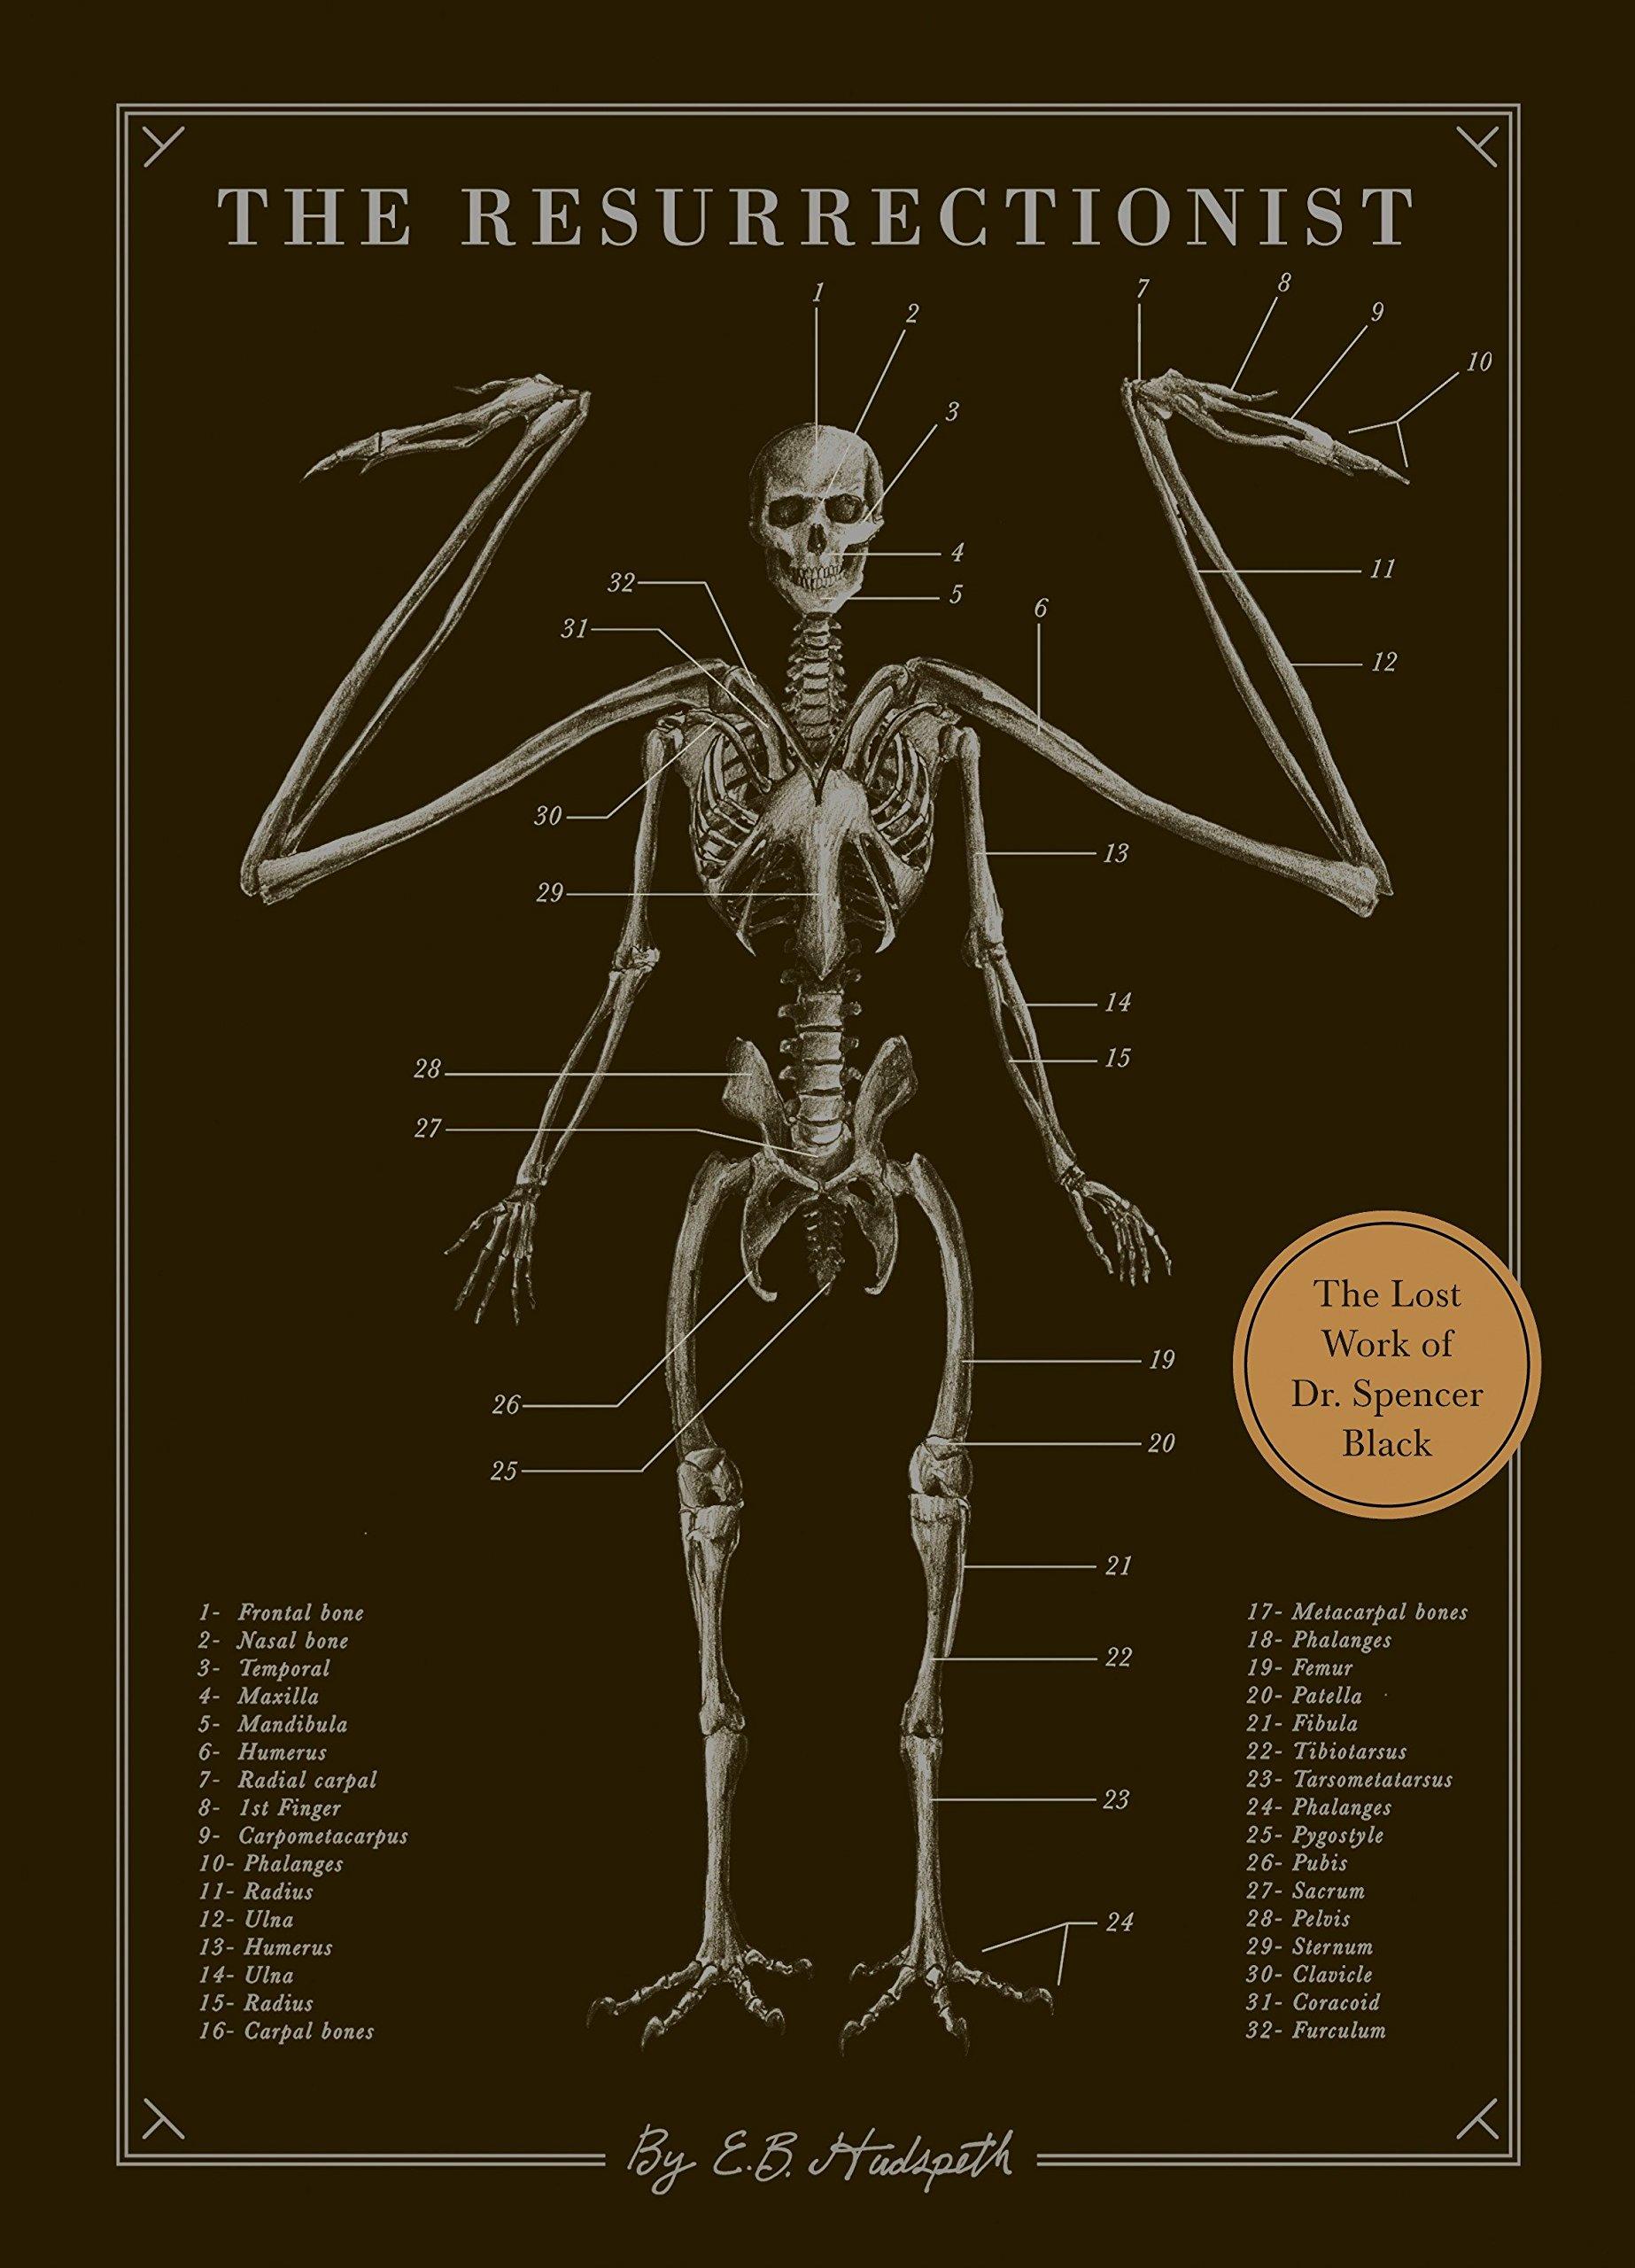 The Resurrectionist: The Lost Work of Dr. Spencer Black (Inglese) Copertina rigida – Illustrato, 17 apr 2013 E. B. Hudspeth Quirk Books 1594746168 Fiction